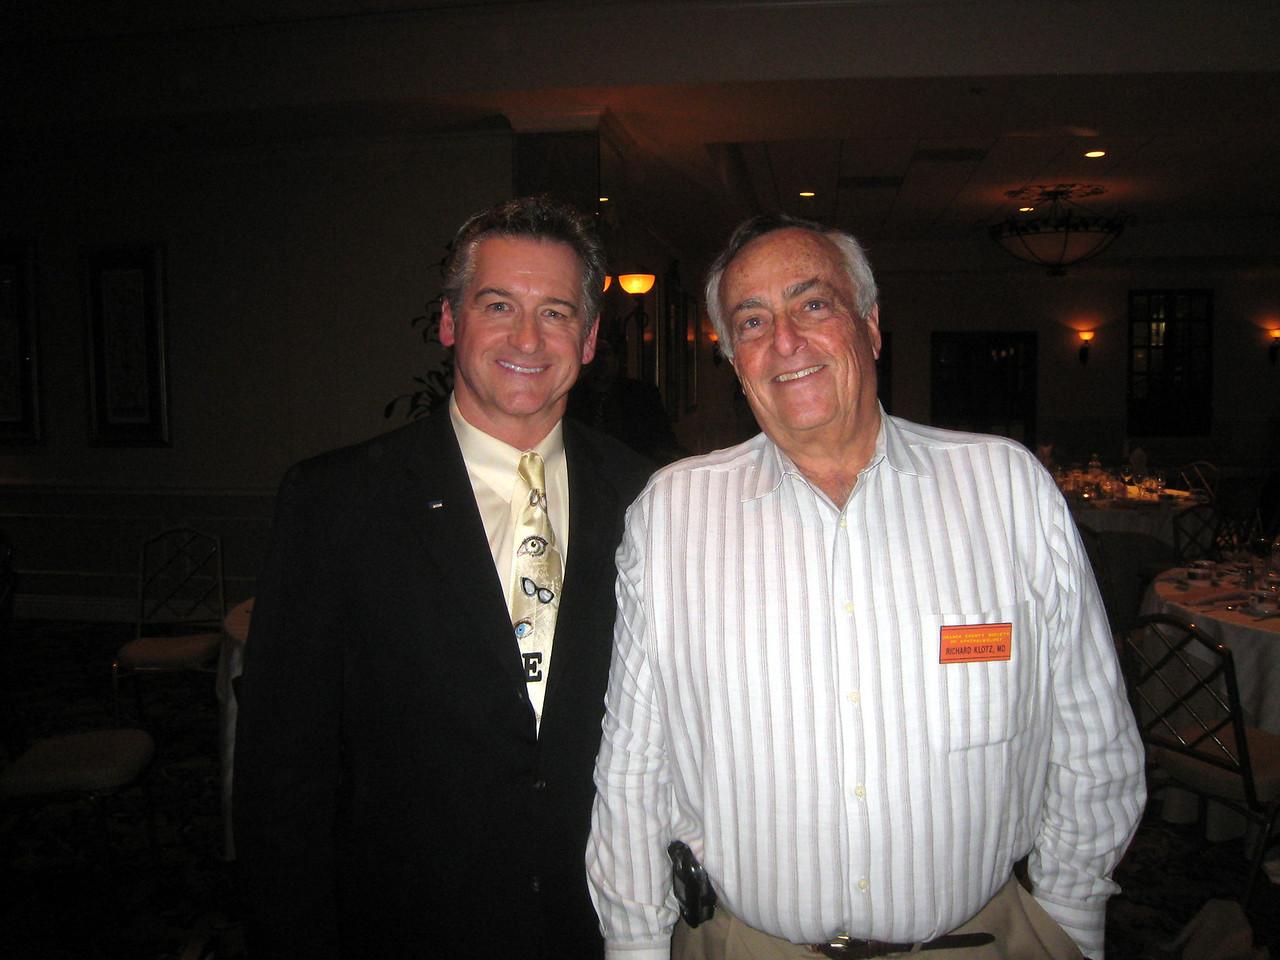 10 Gary Bond from Alcon with Richard Klotz